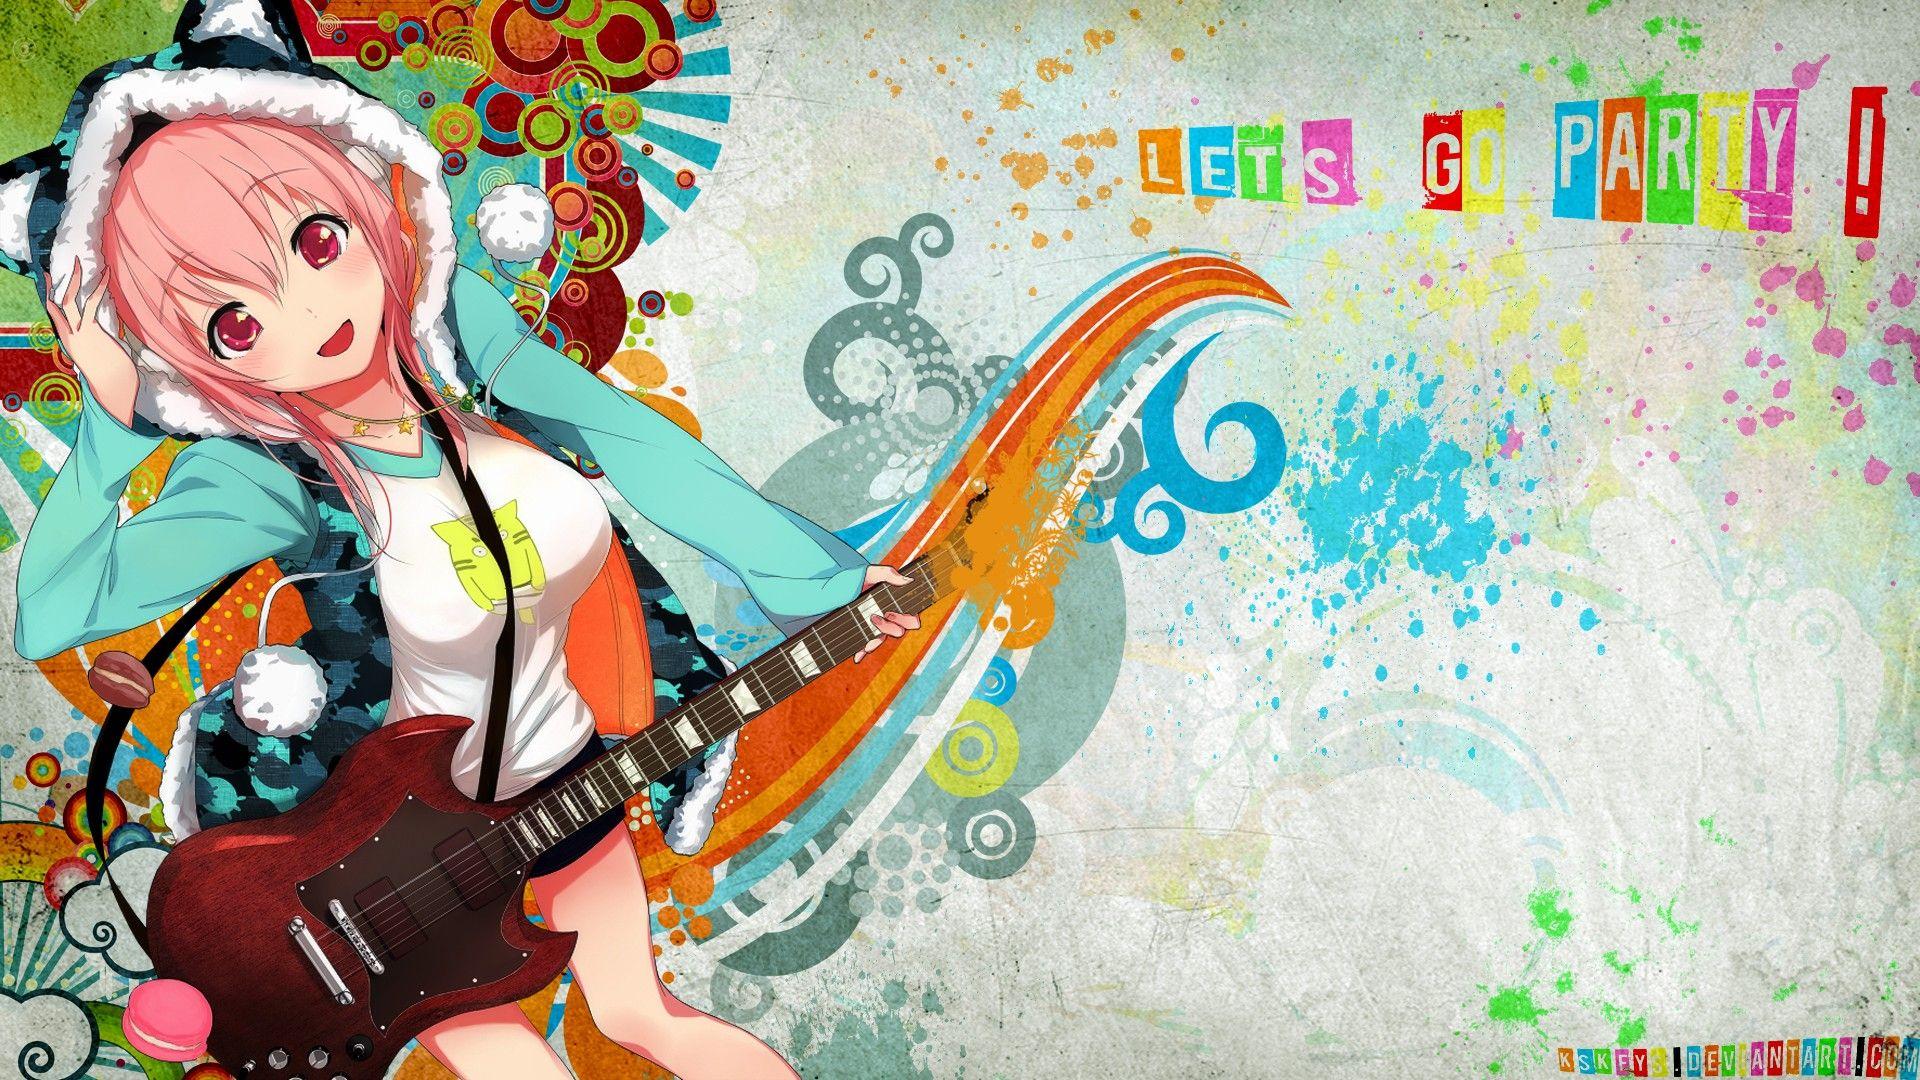 Anime Girl with Headphones Hoodie Cool 19754wall.jpg